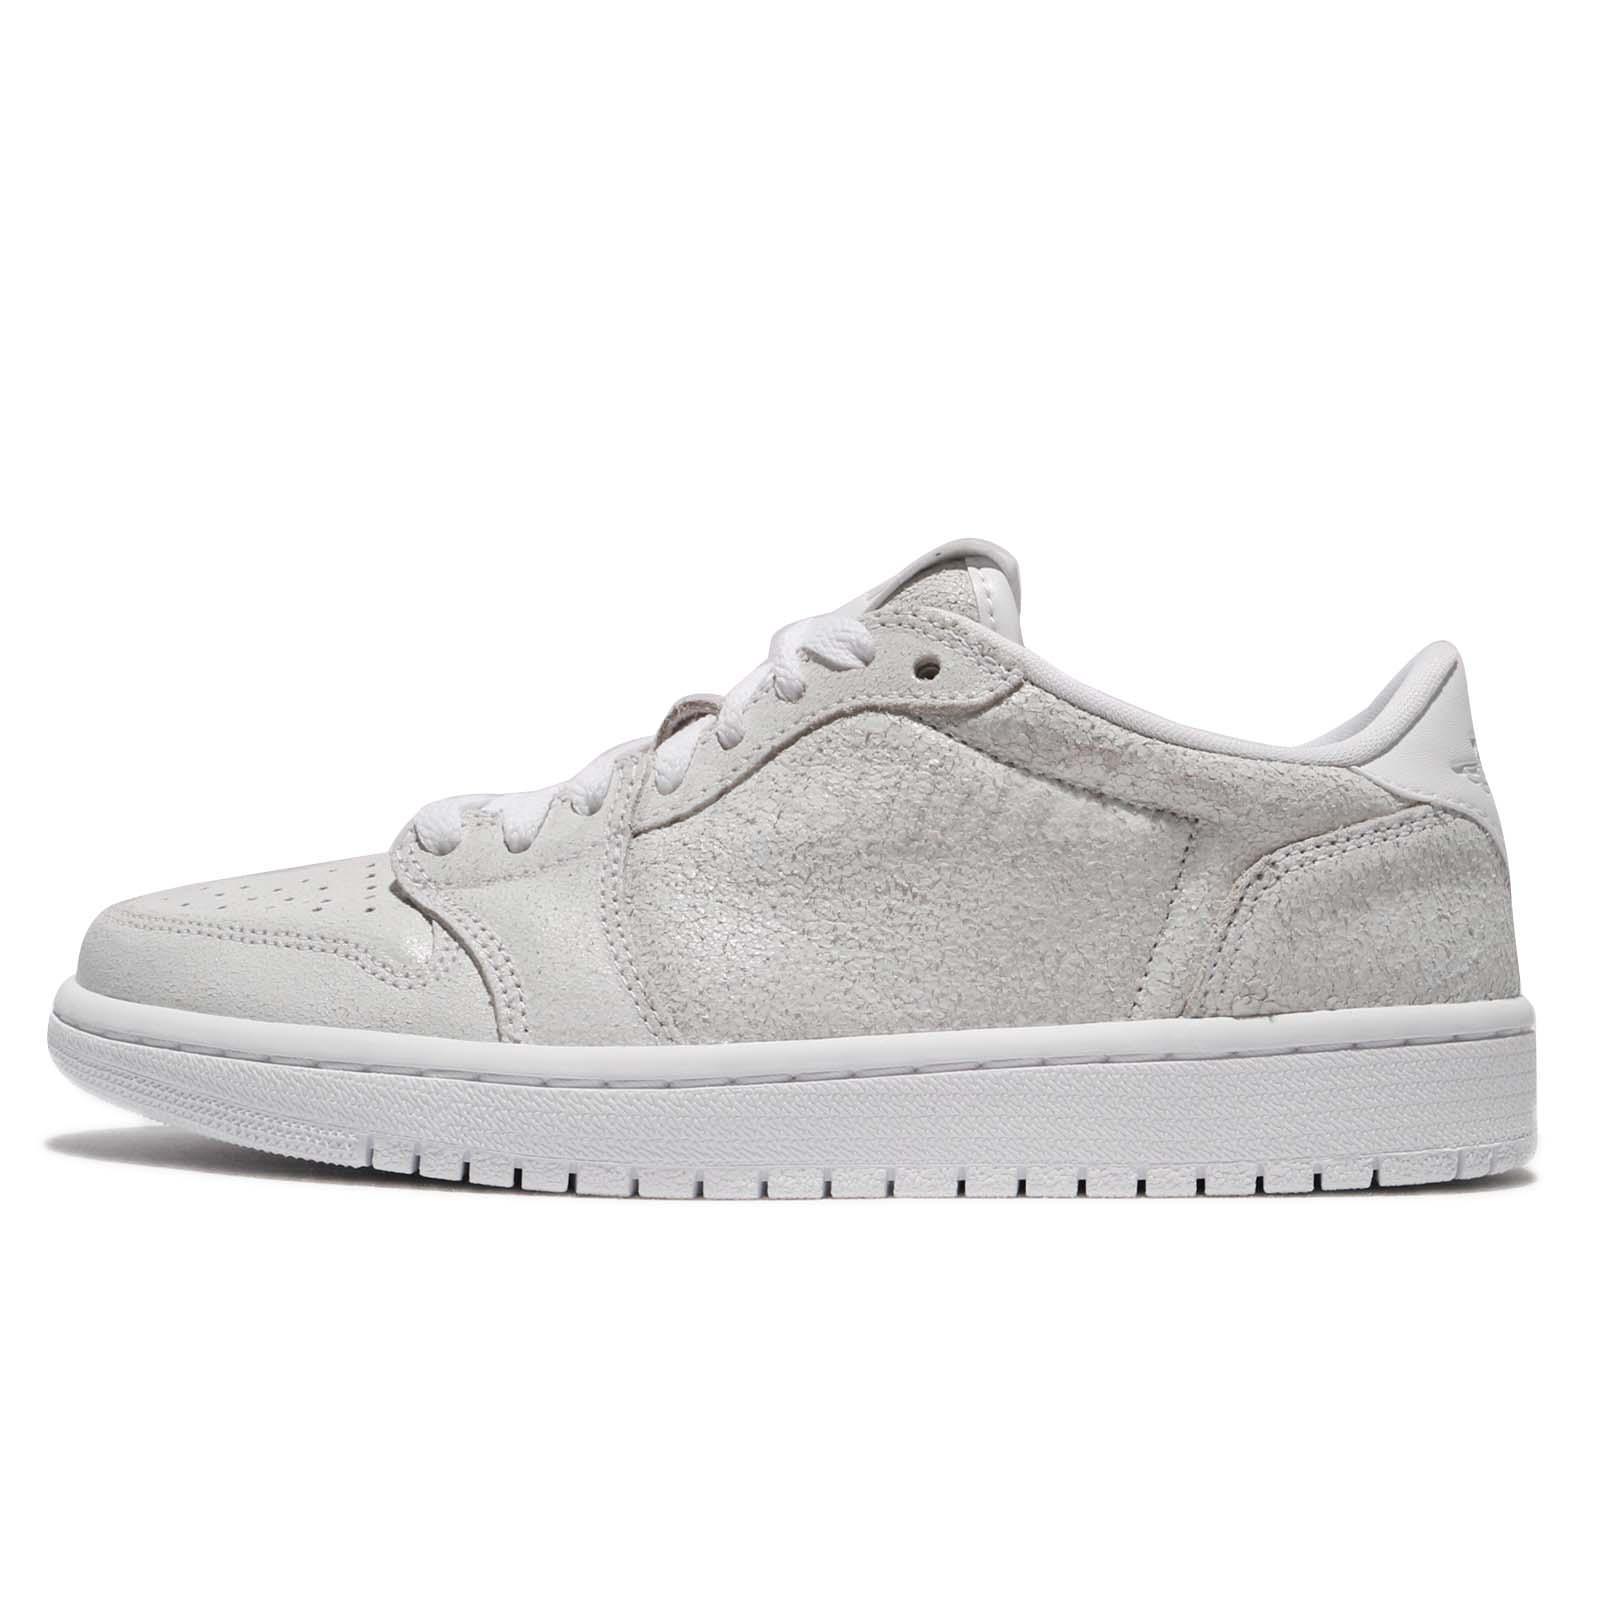 8f57eb274c1630 Nike Wmns Air Jordan 1 Retro Low NS No Swoosh White Grey Women Shoes AH7232- 100